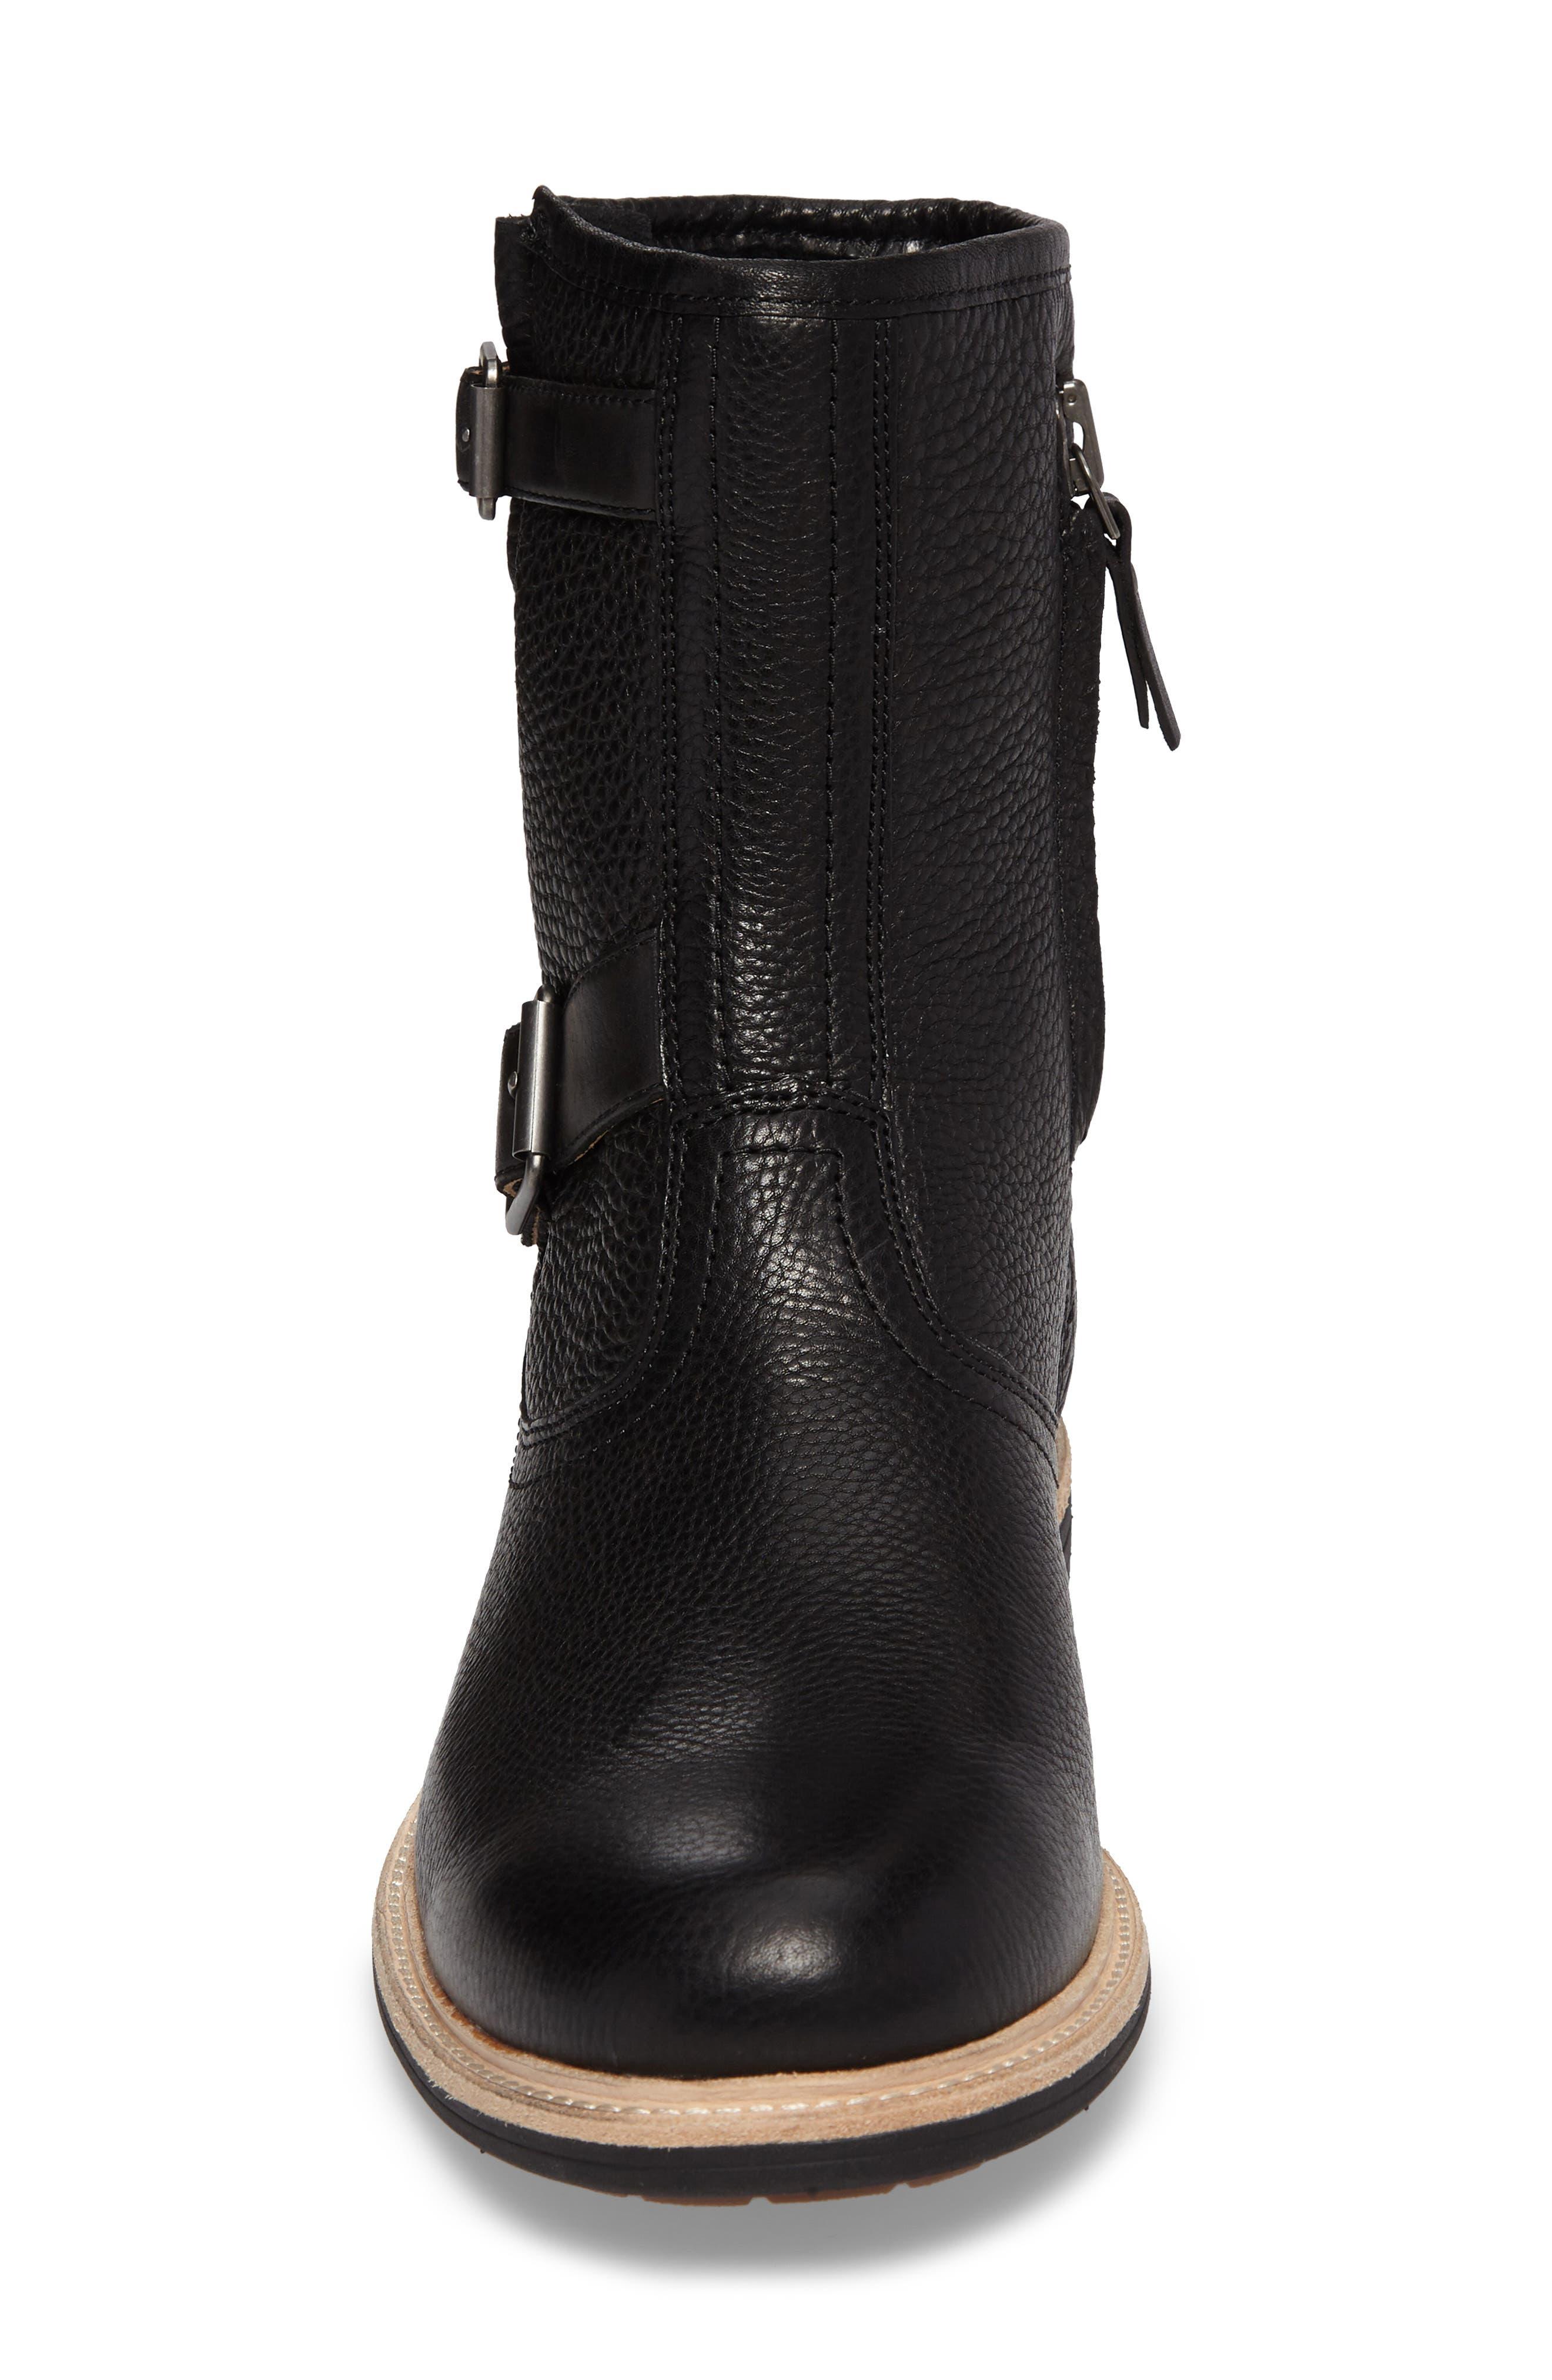 Jaren Zip Boot with Genuine Shearling,                             Alternate thumbnail 4, color,                             Black